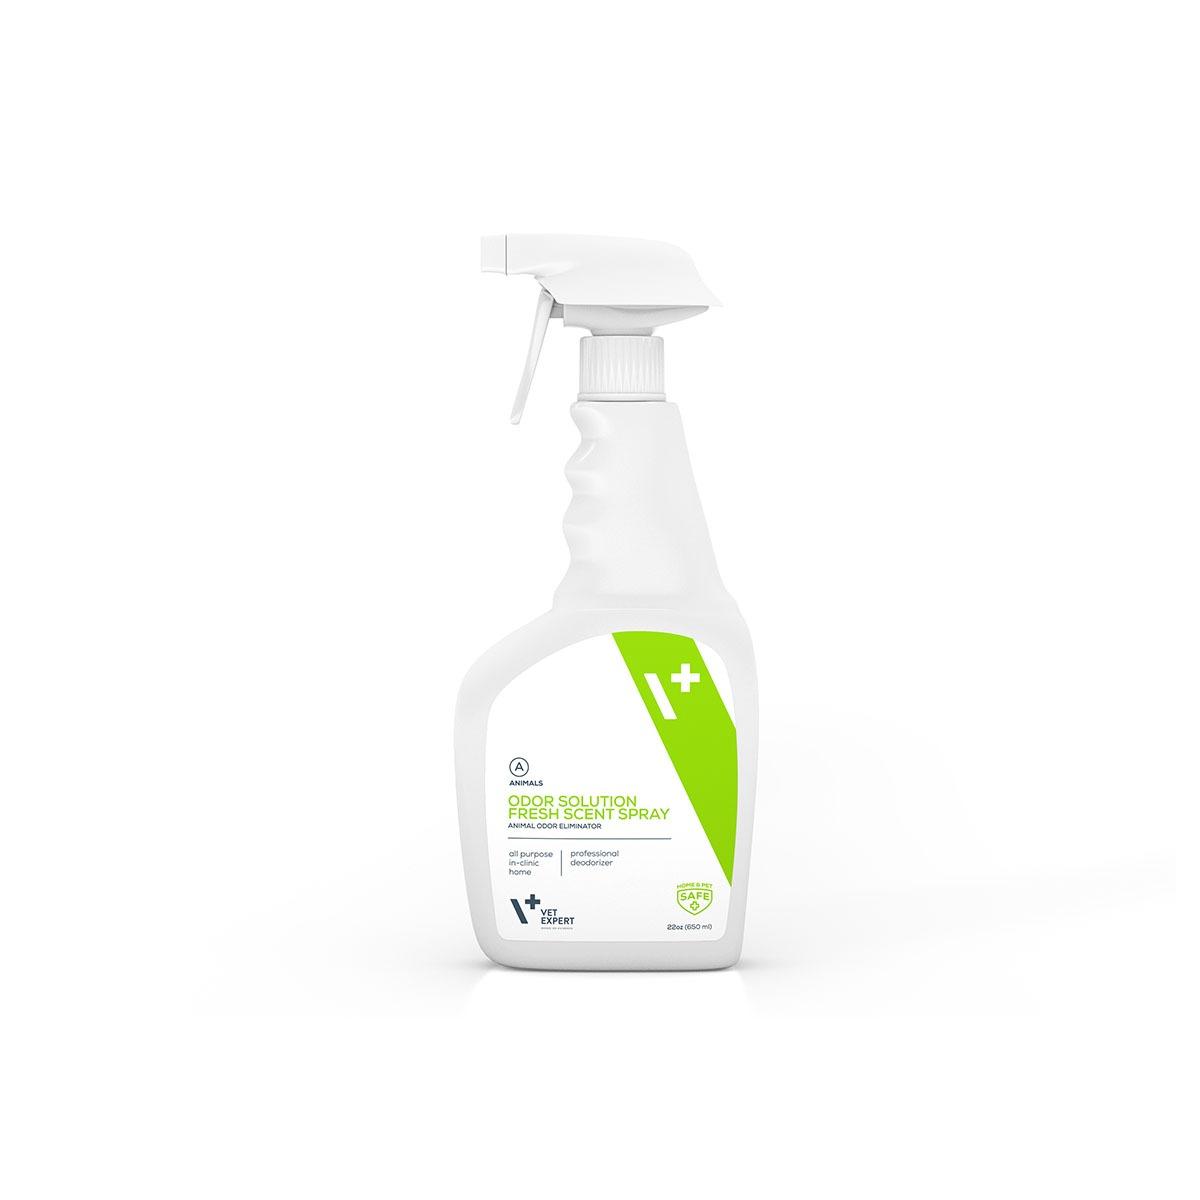 VetExpert Odor Solution Spray Fresh Scent Tierarztbedarf, Veterinärbedarf, Veterinärmedizin, Praxisbedarf, Ergänzungsfuttermittel, Tierarztprodukten, Tierapotheke, Tierpflegeprodukte